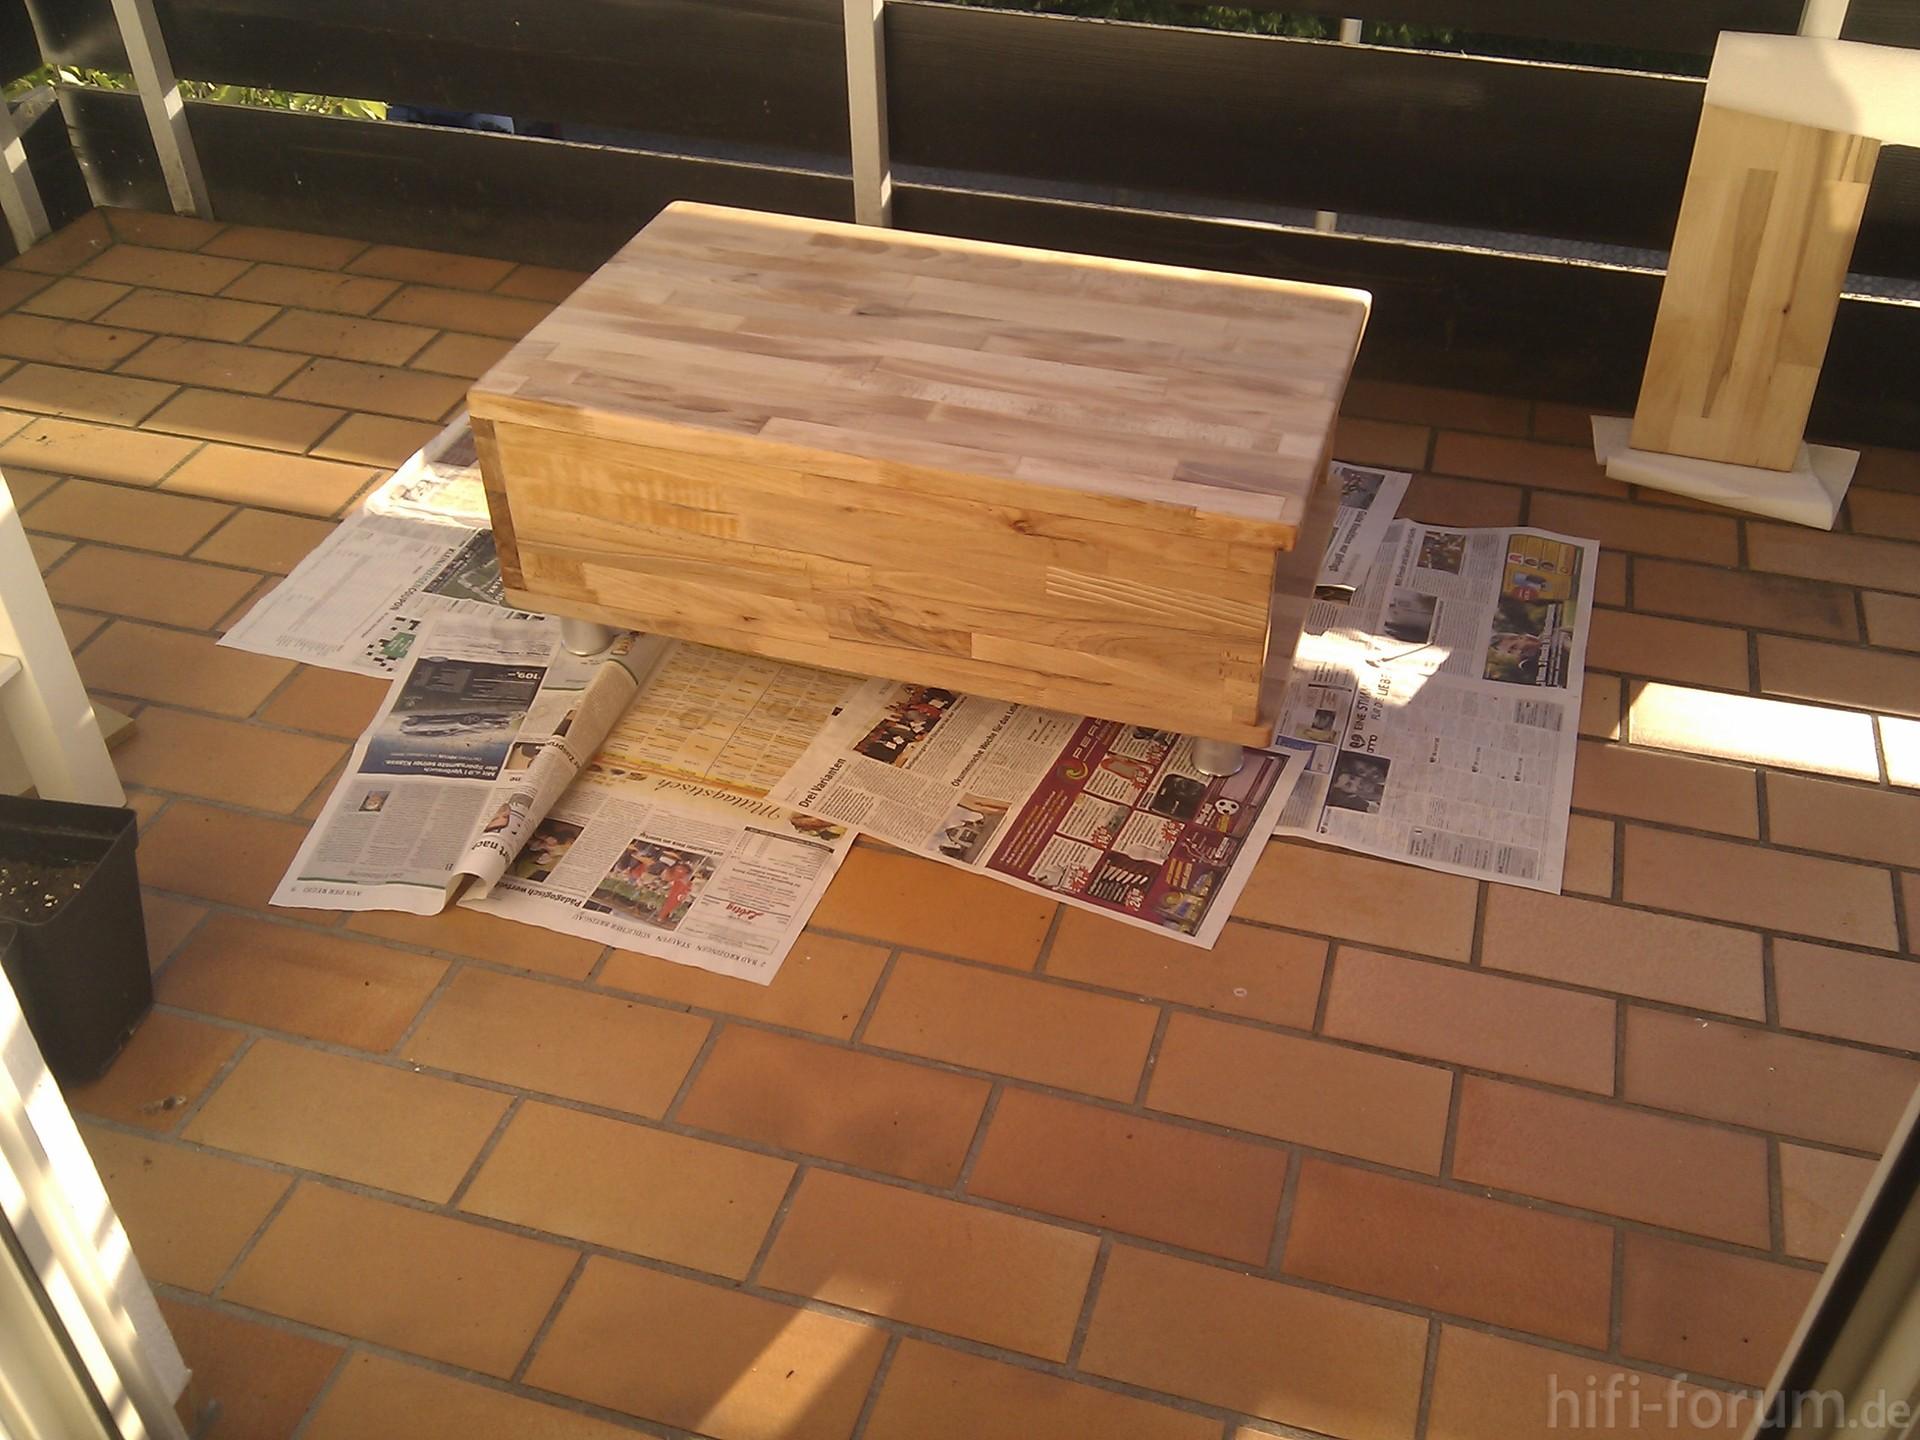 14 hifi bildergalerie. Black Bedroom Furniture Sets. Home Design Ideas